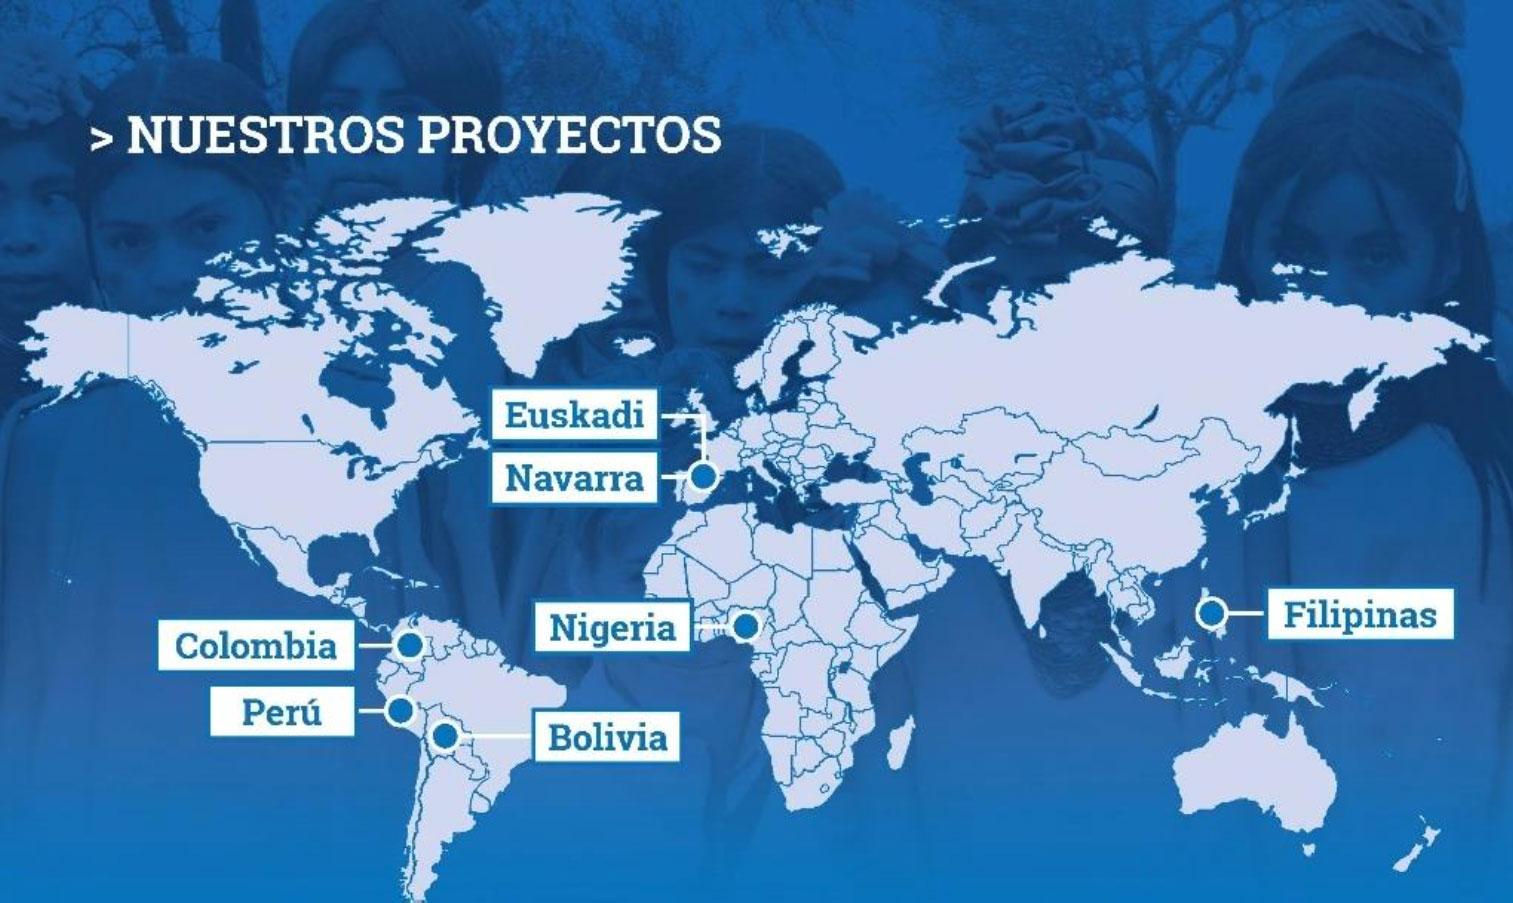 proyectos-zabalketa-mapa